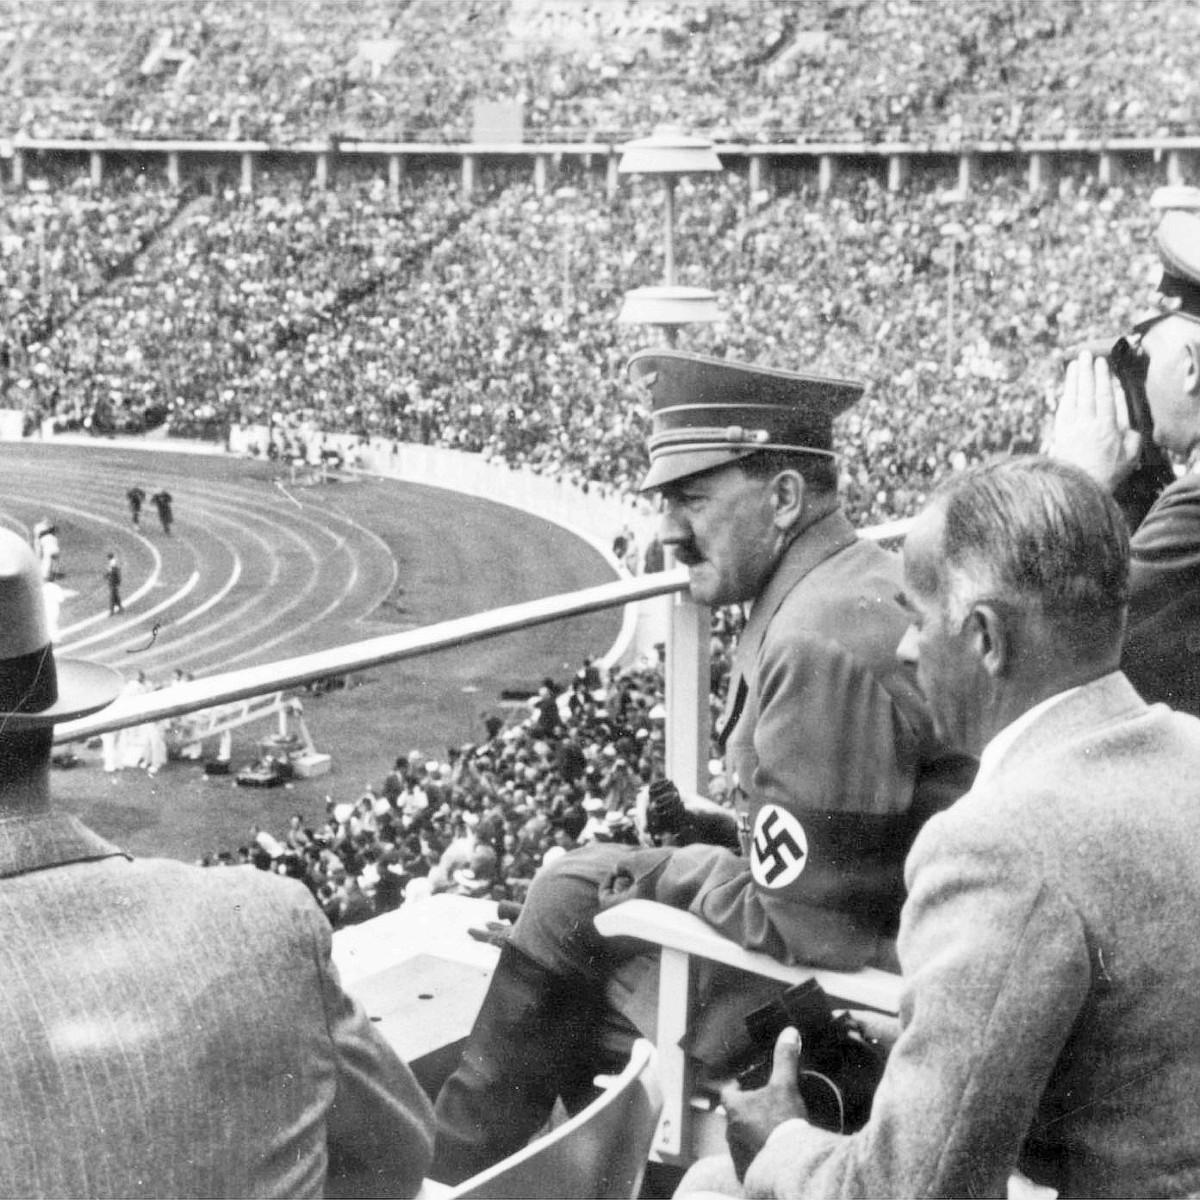 Olympische Spiele In Berlin Propaganda Und Spektakel Berliner Morgenpost